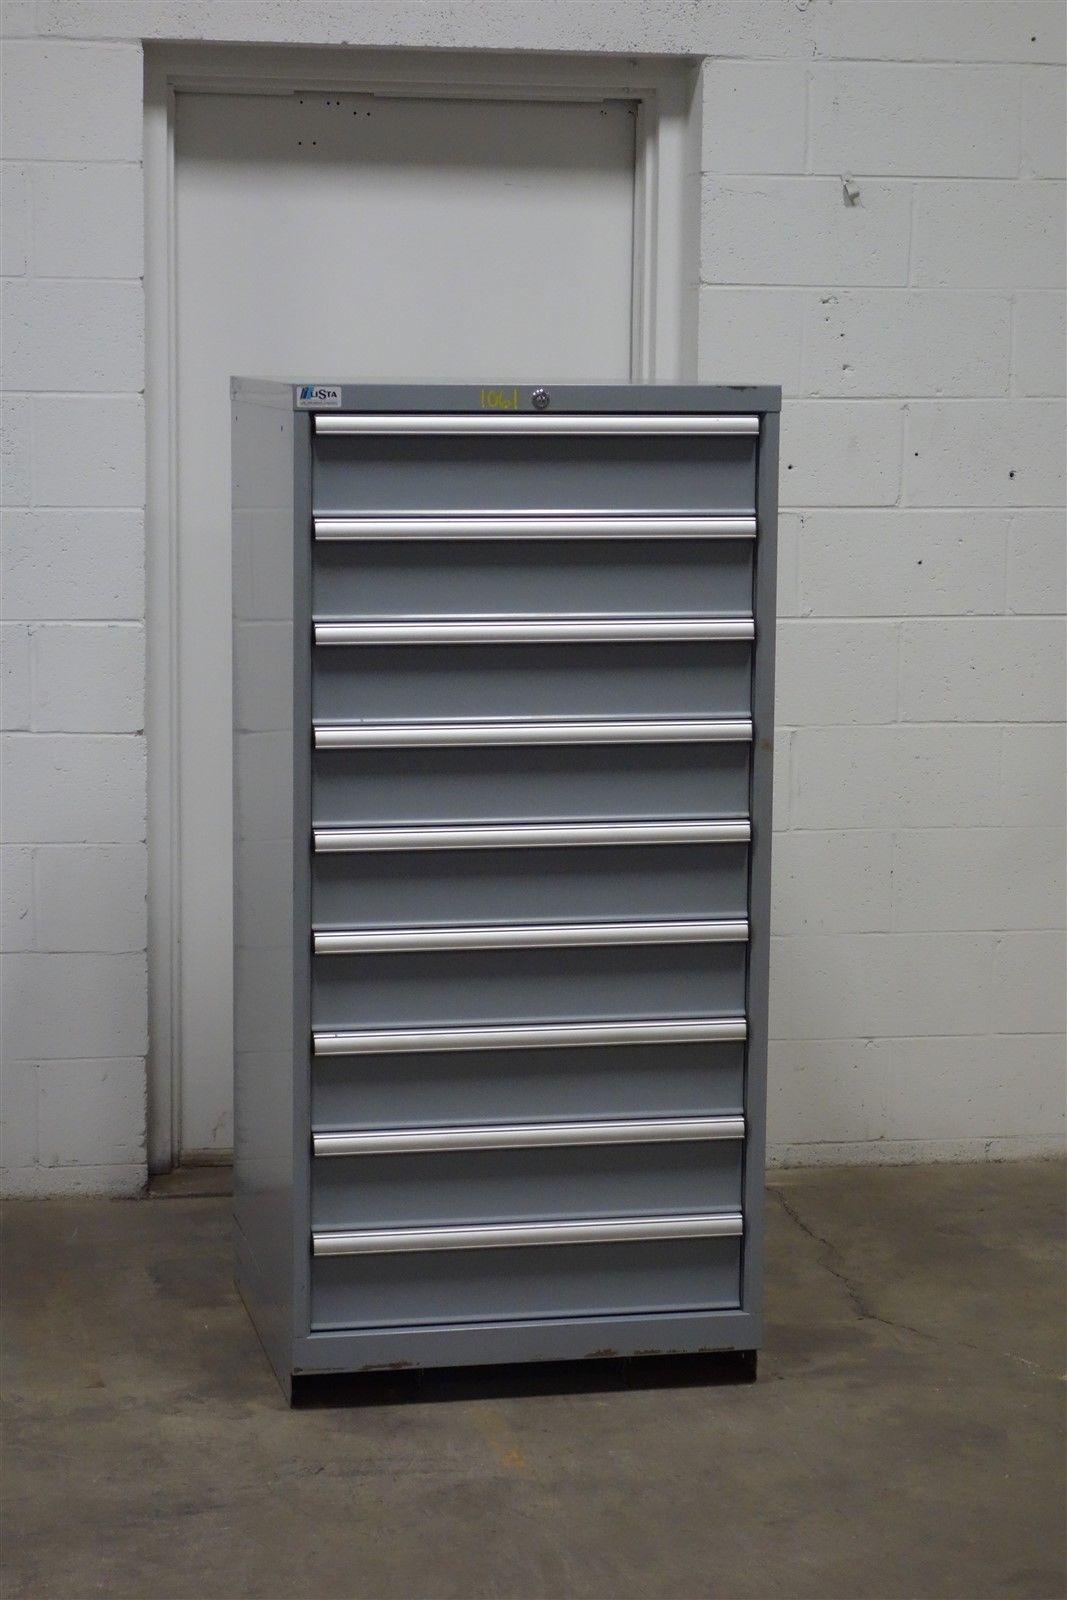 Used Lista 9 drawer cabinet industrial tool storage bin